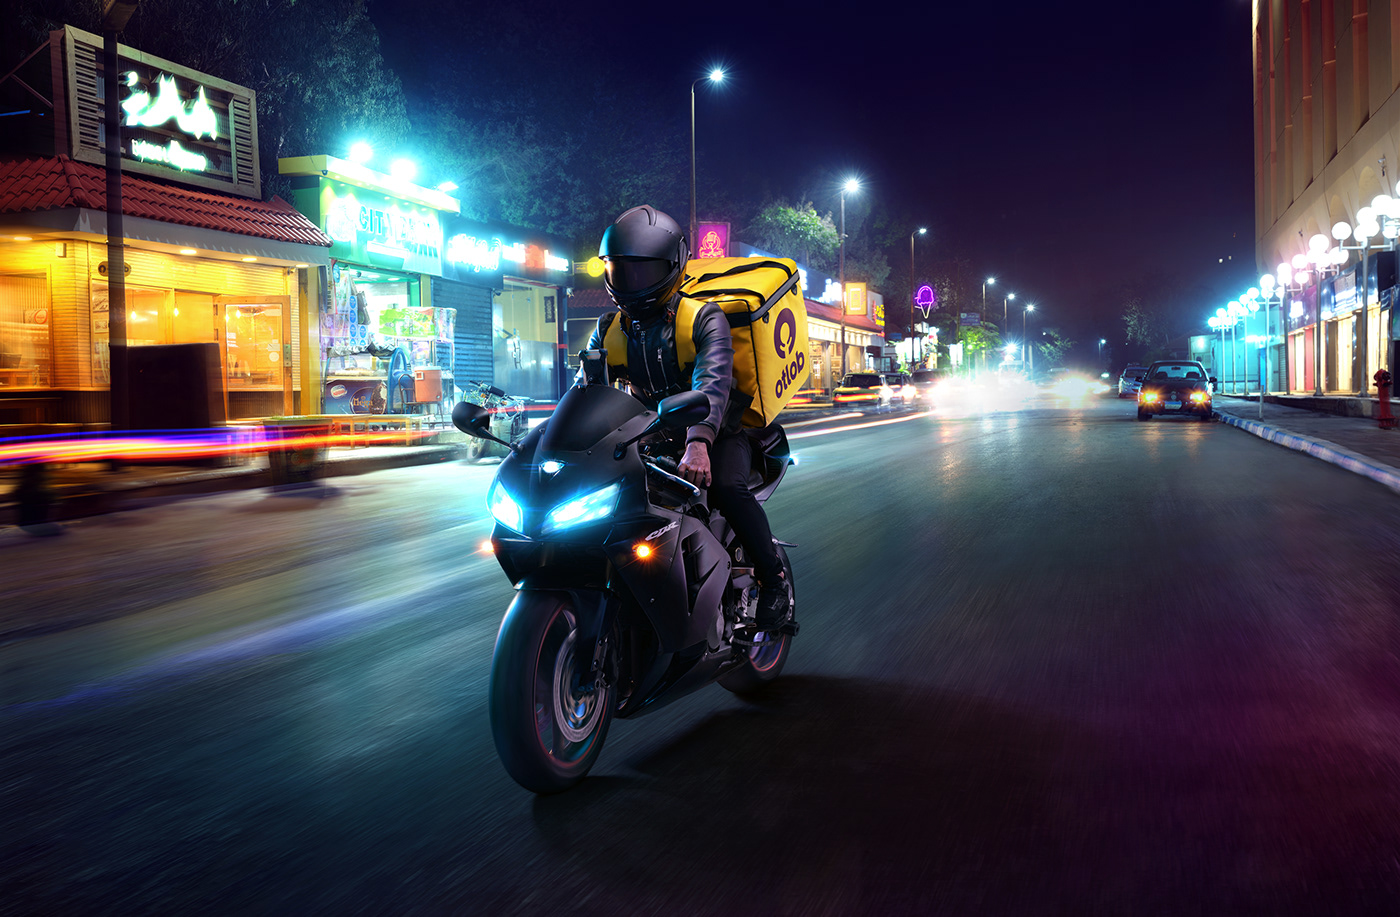 Otlob neon motorcycle delivery campagin Food  maadi egypt Advertising  Photo Manipulation